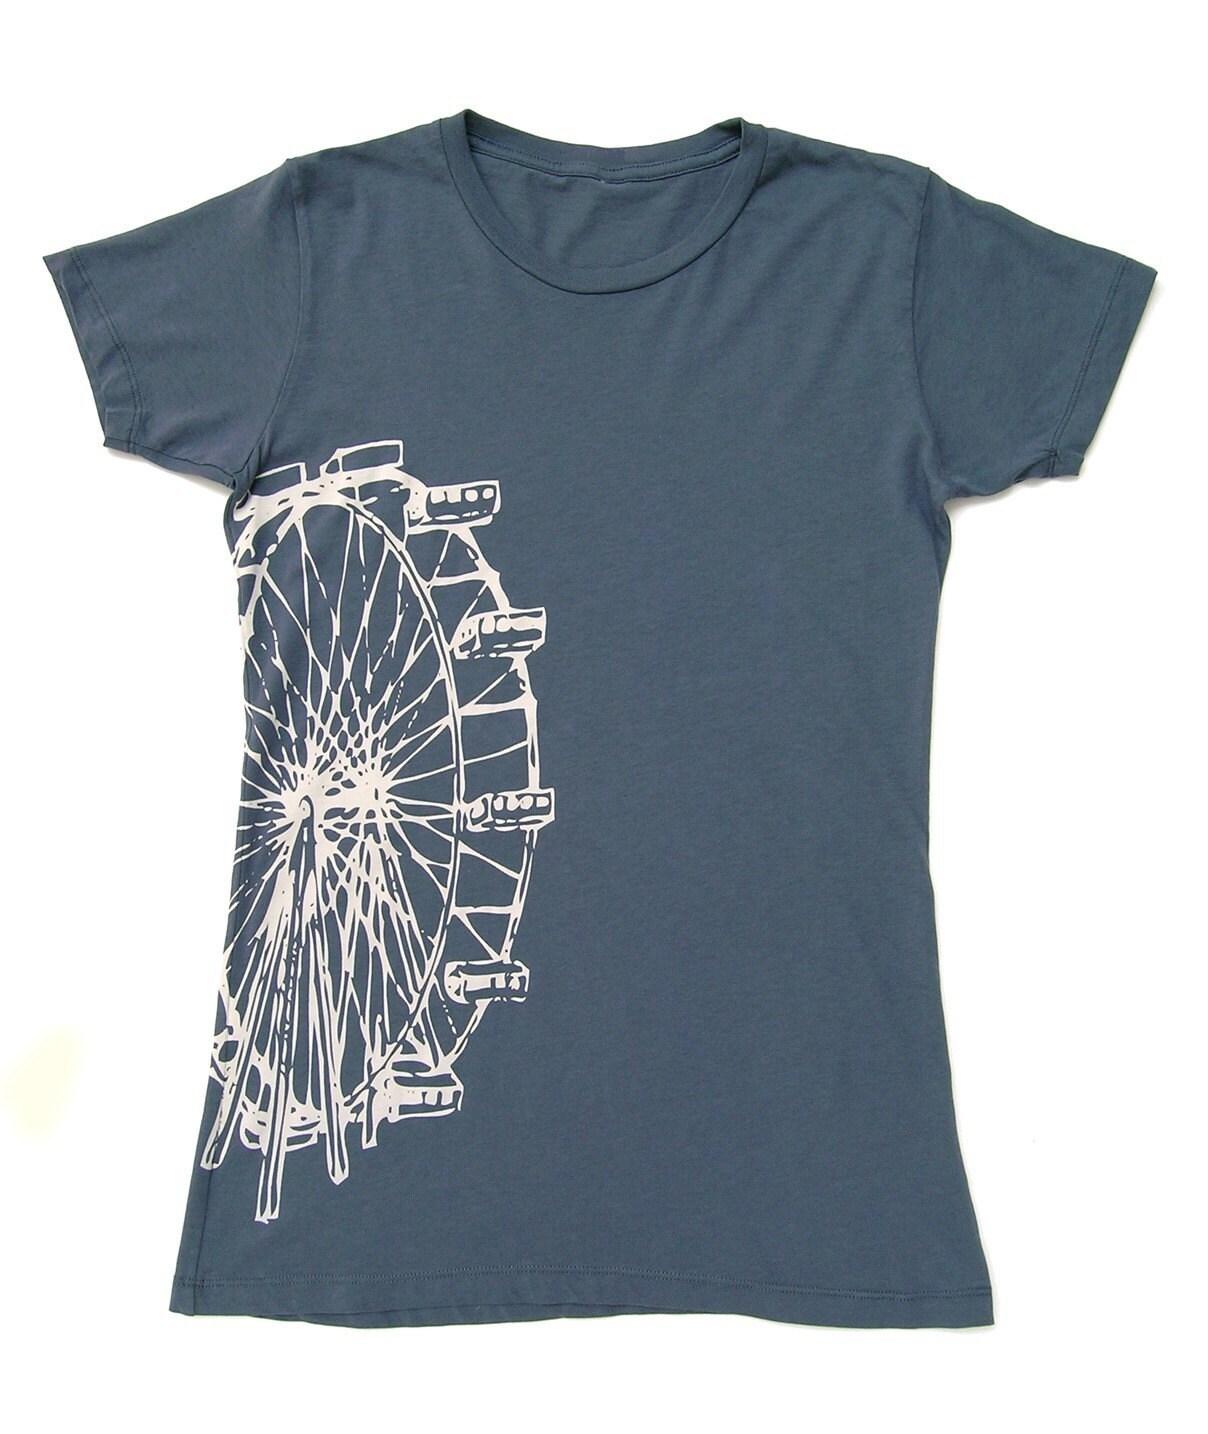 Ferris Wheel T-shirt Size L